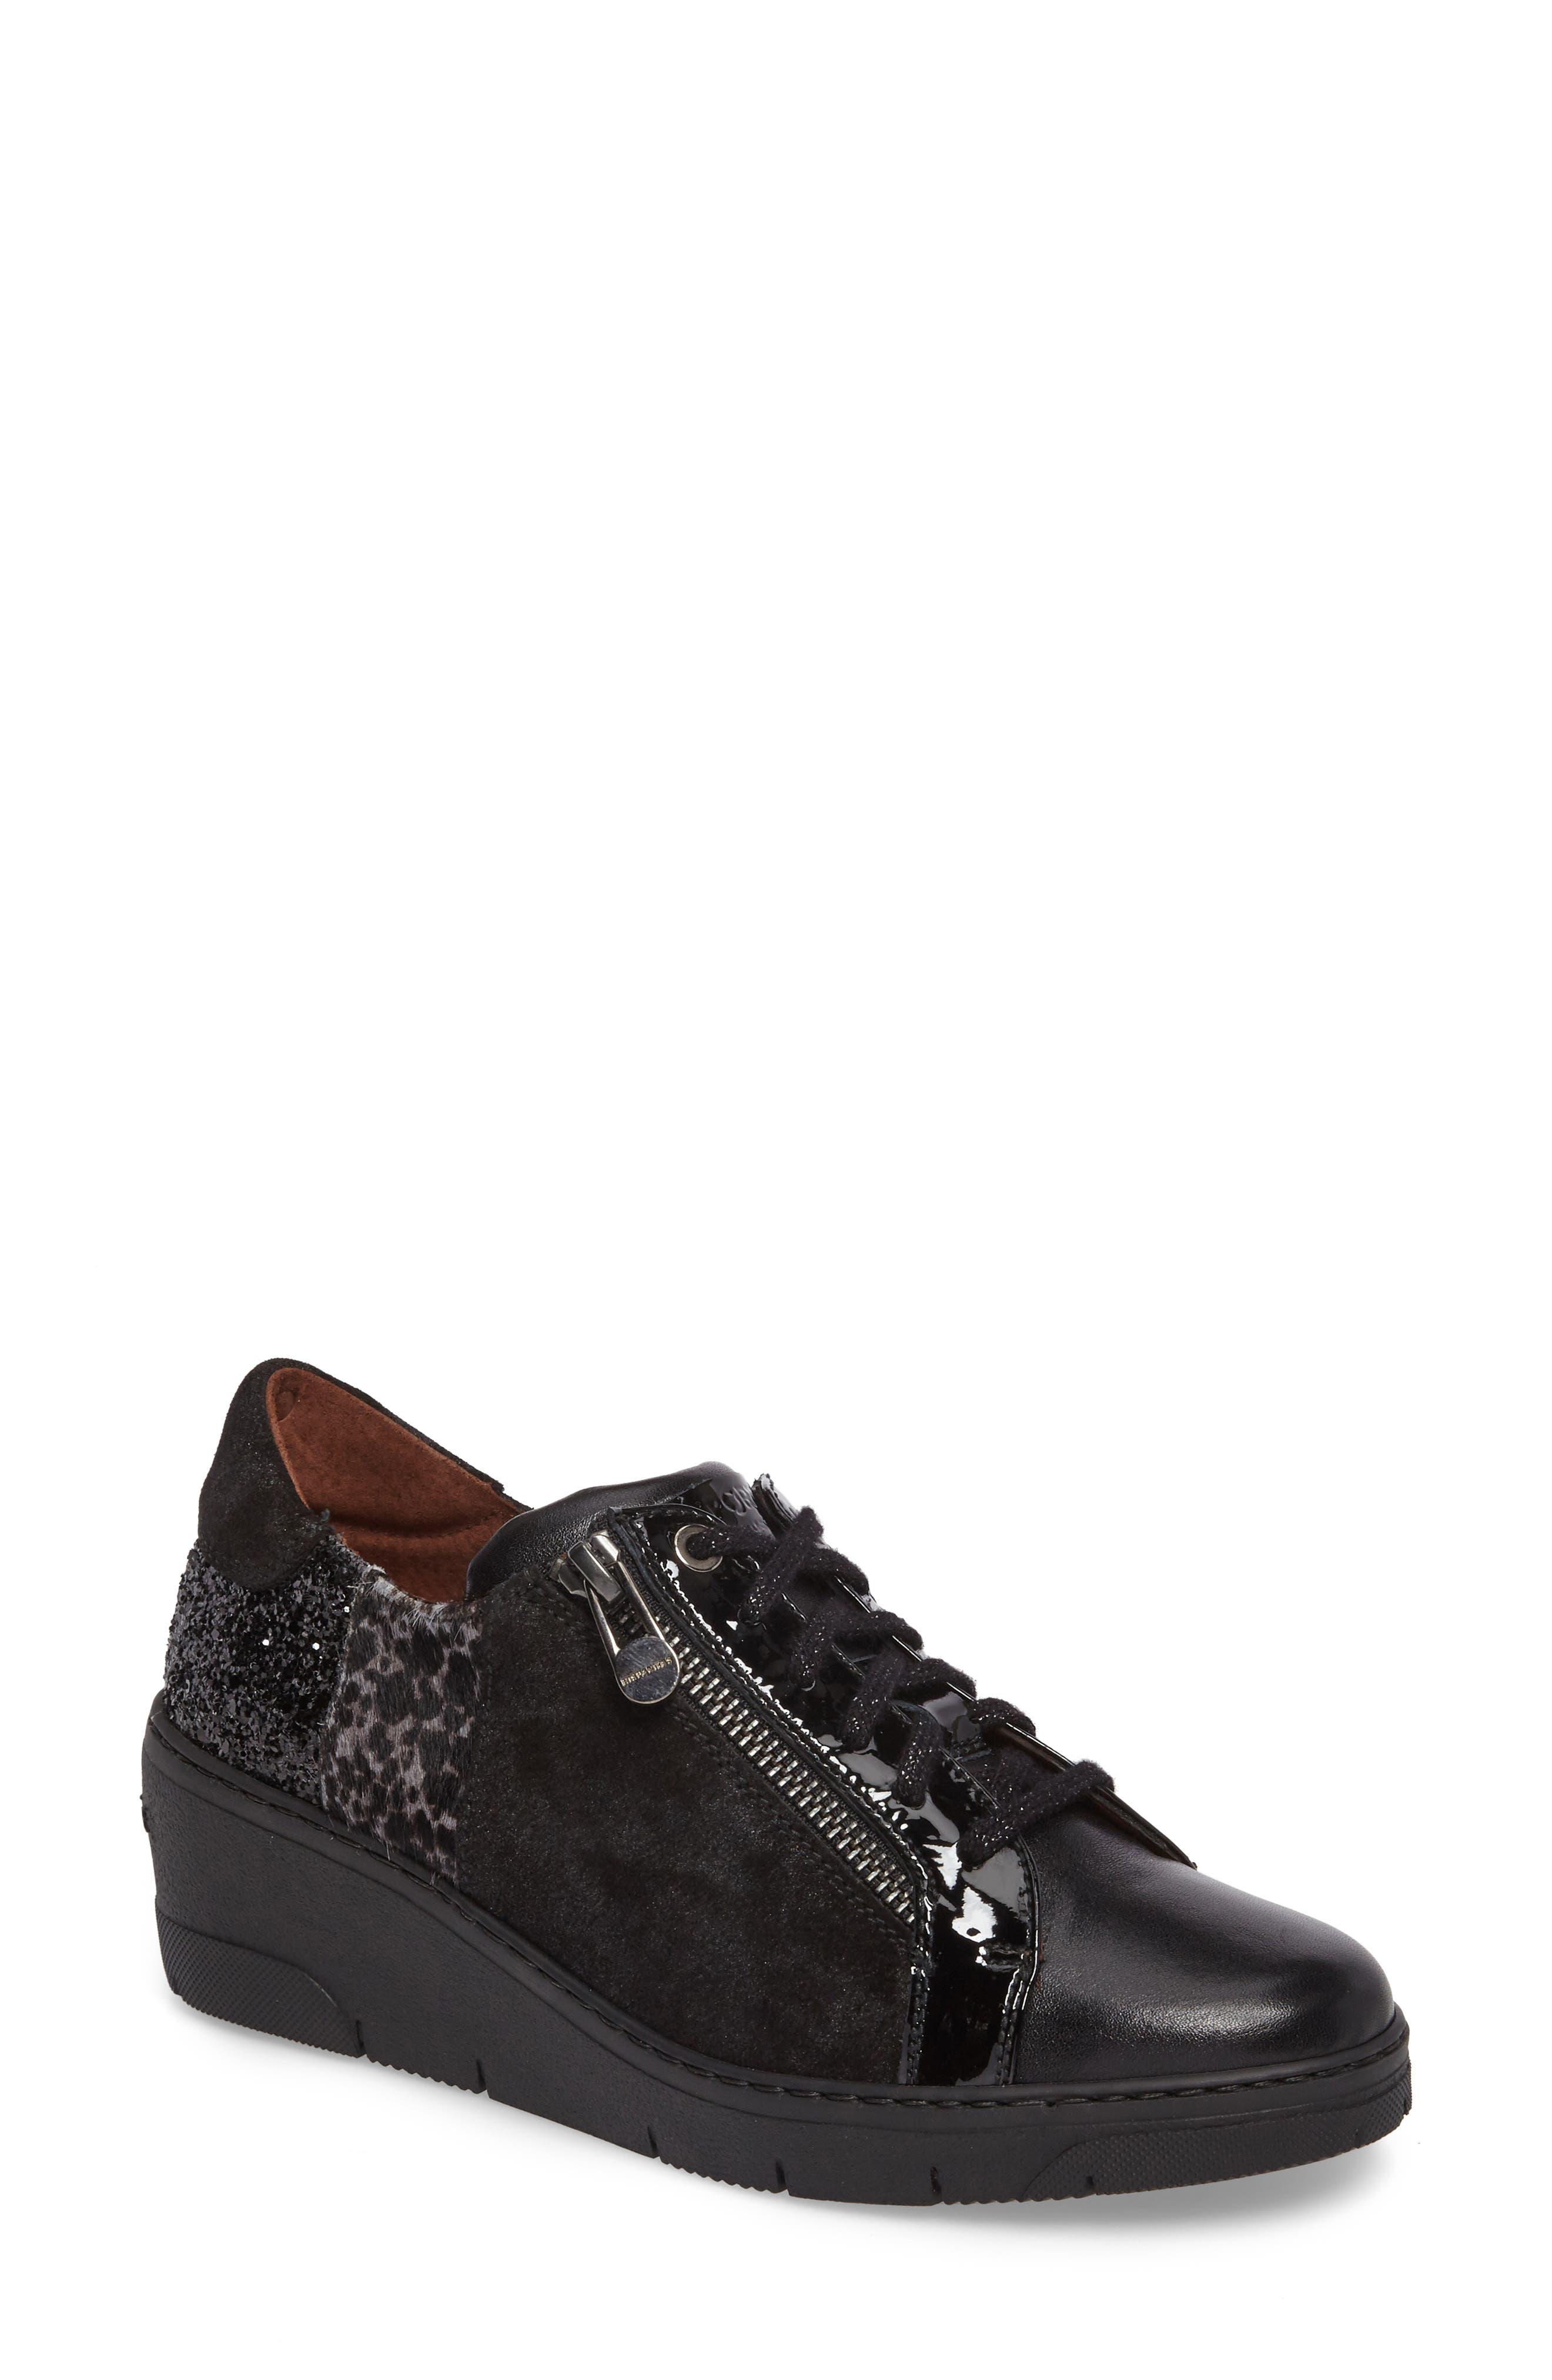 Sammi Sneaker,                             Main thumbnail 1, color,                             Black Leather